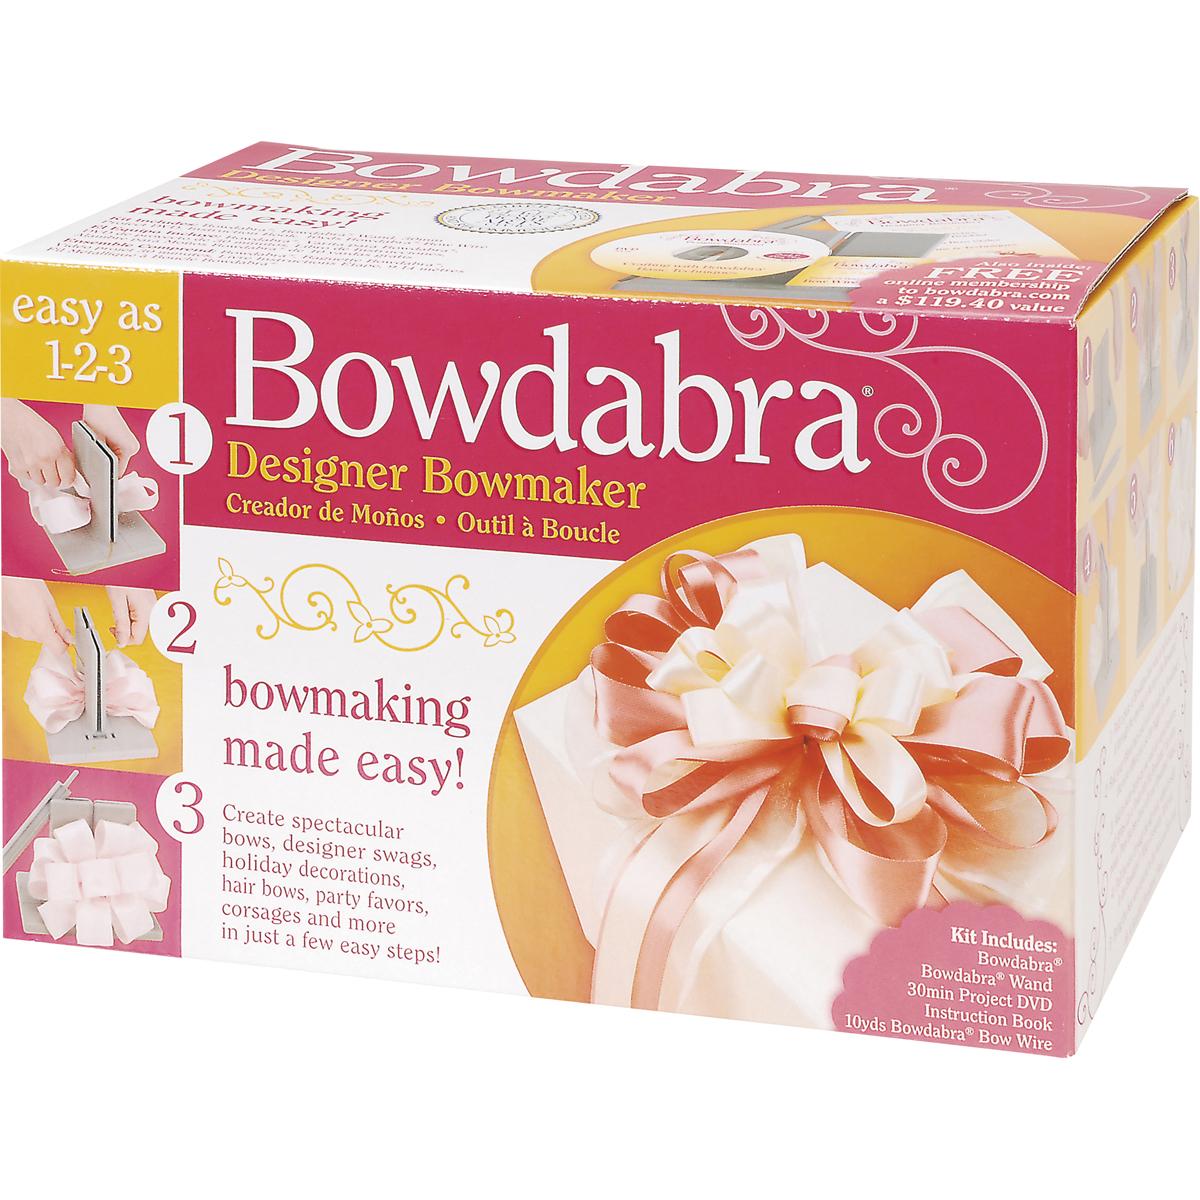 BOWDABRA BOW MAKER